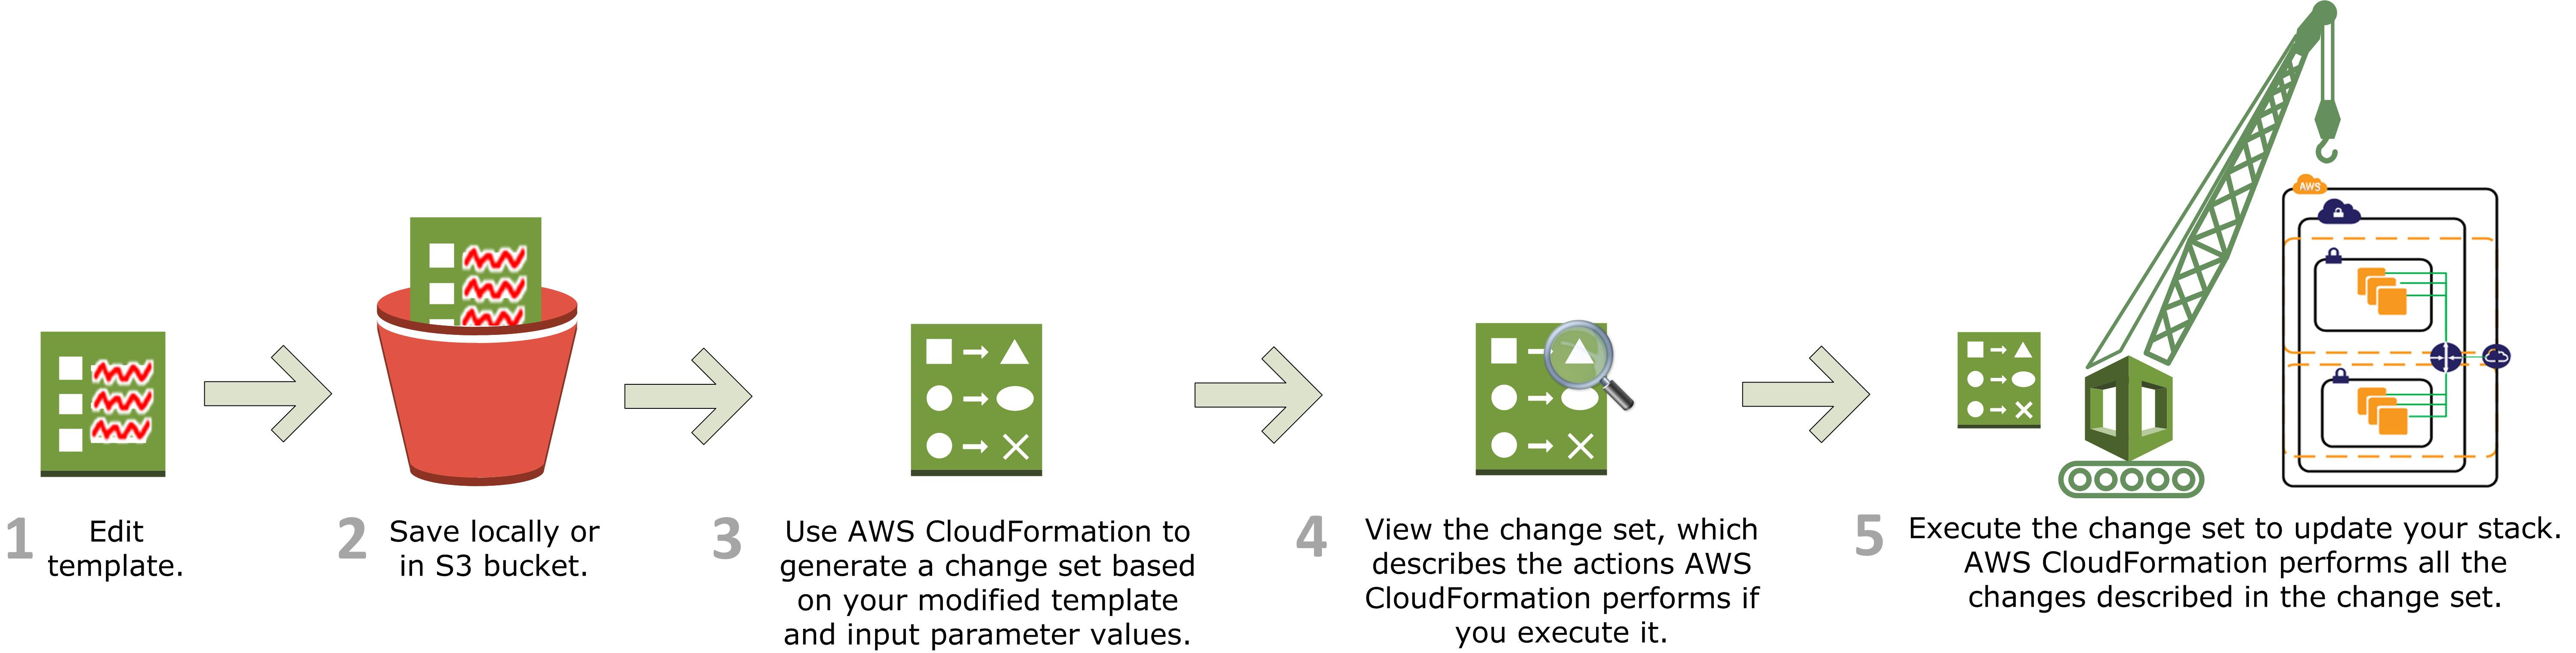 Wie funktioniert AWS CloudFormation? - AWS CloudFormation